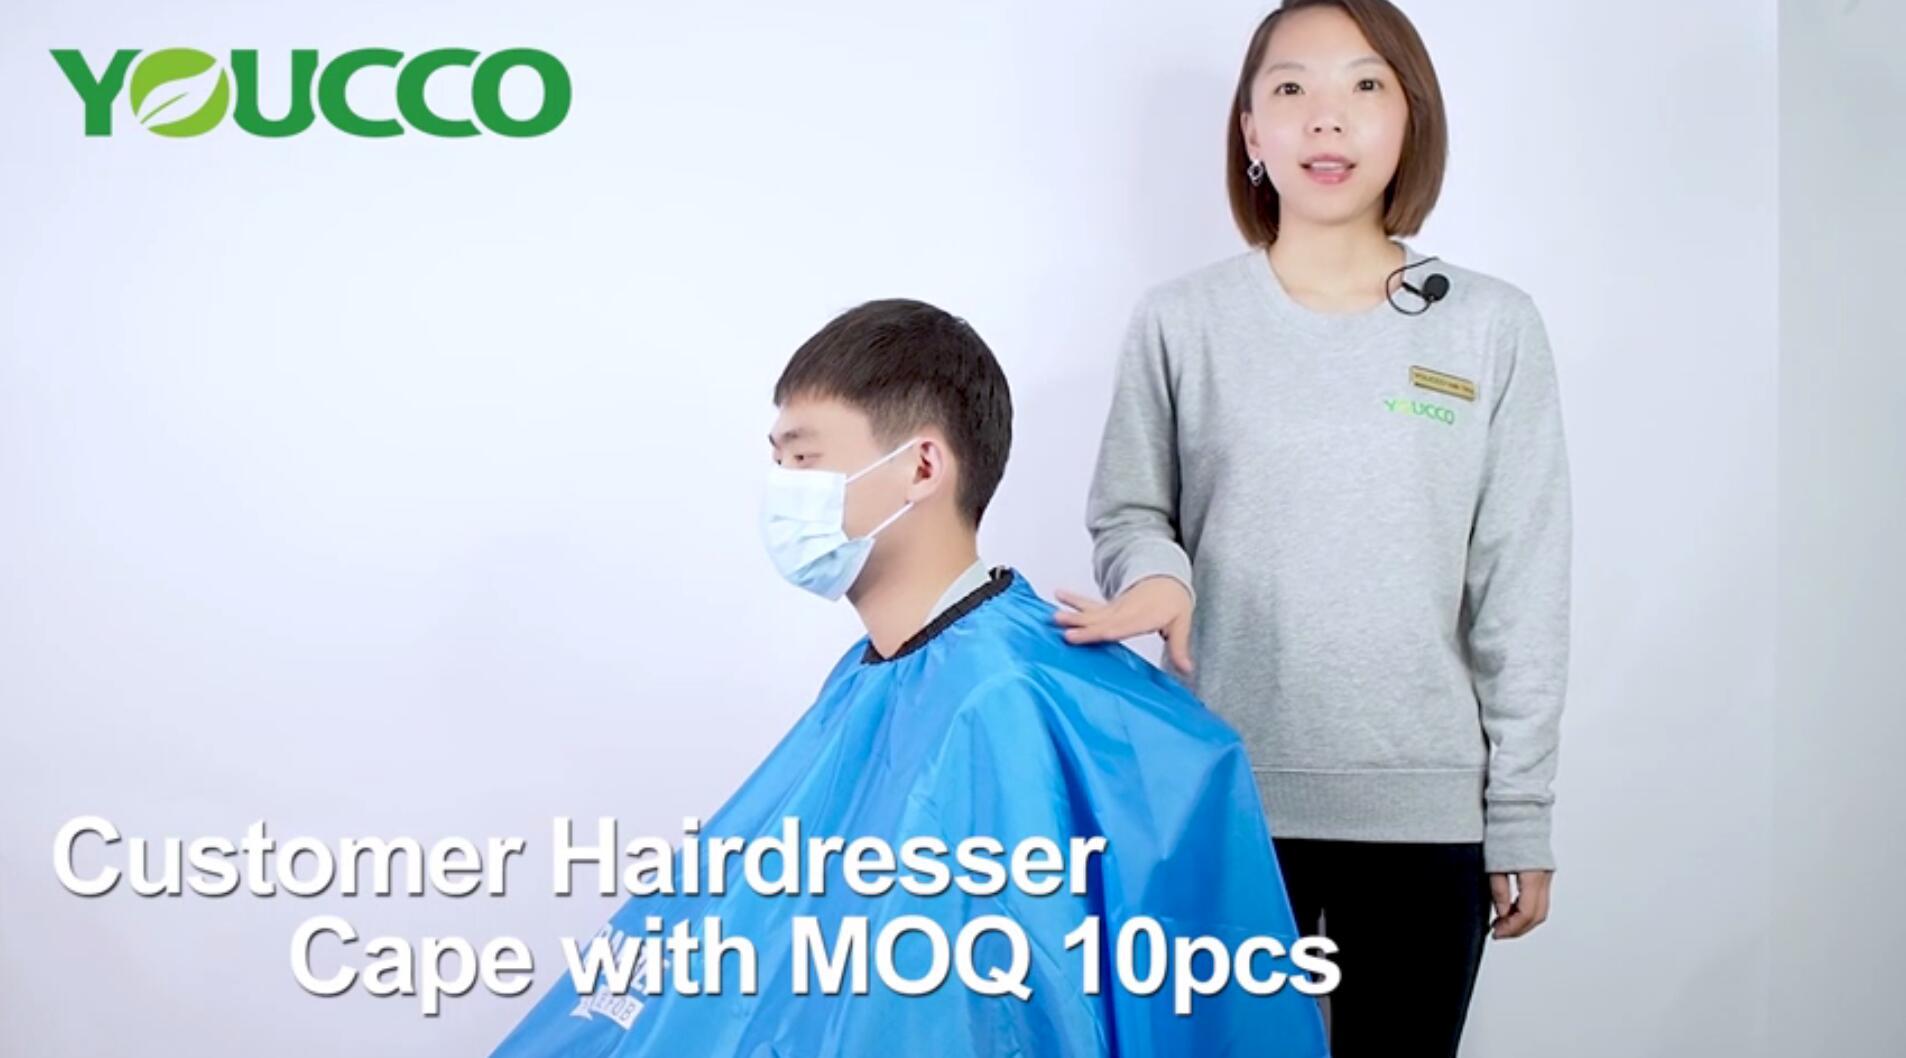 HighQuality Custom Small MOQ Customized Hairdresser Capes 210311 Wholesale MOQ10pcs